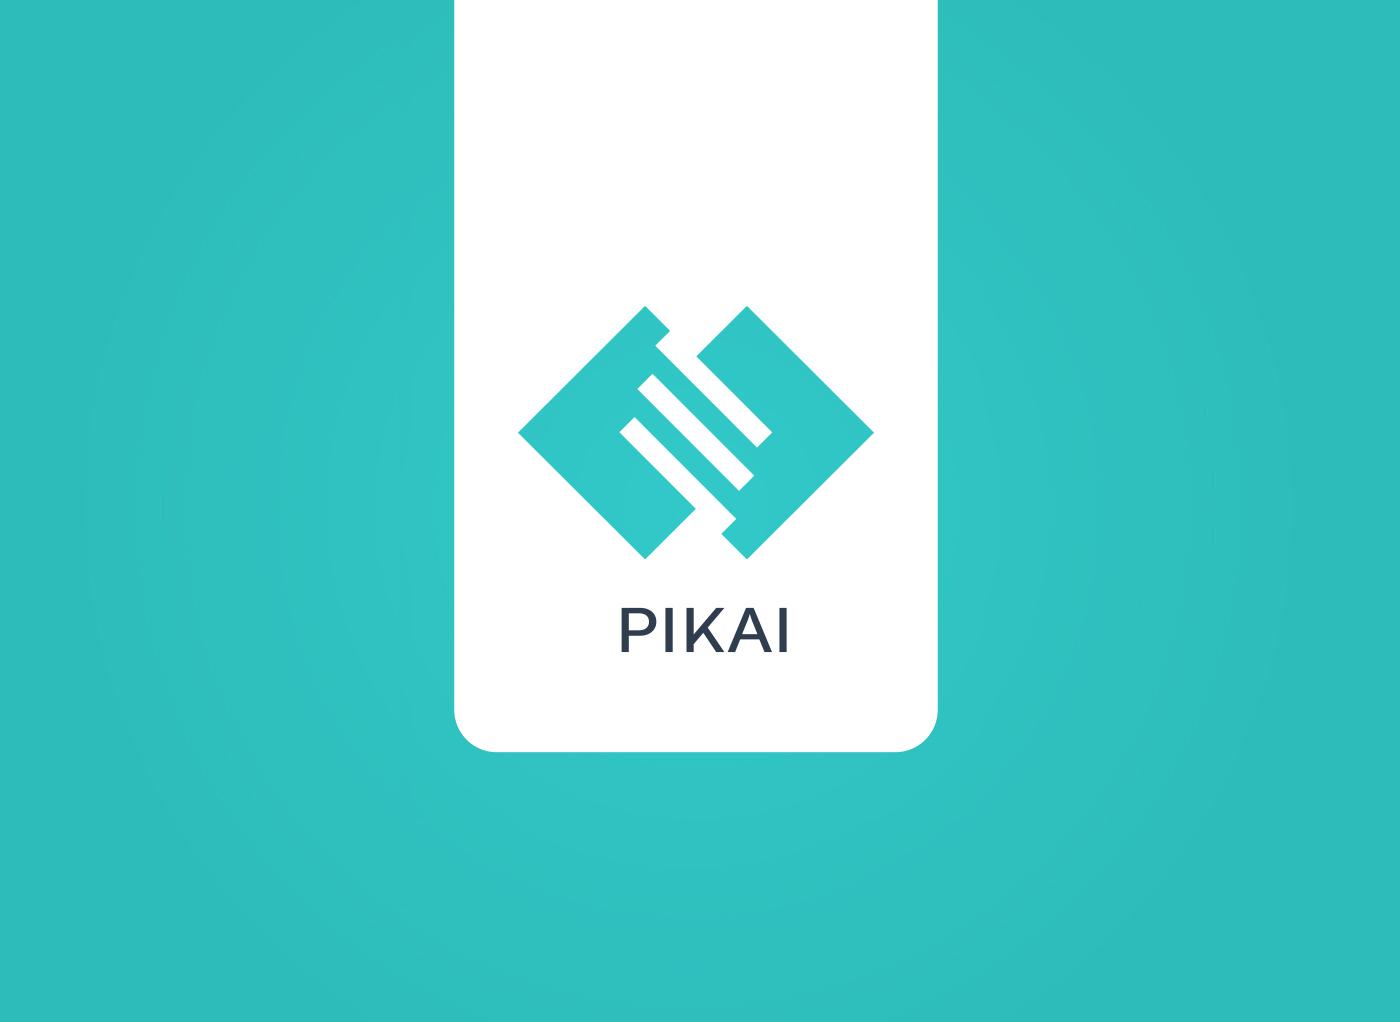 PIKAI Identity & Website